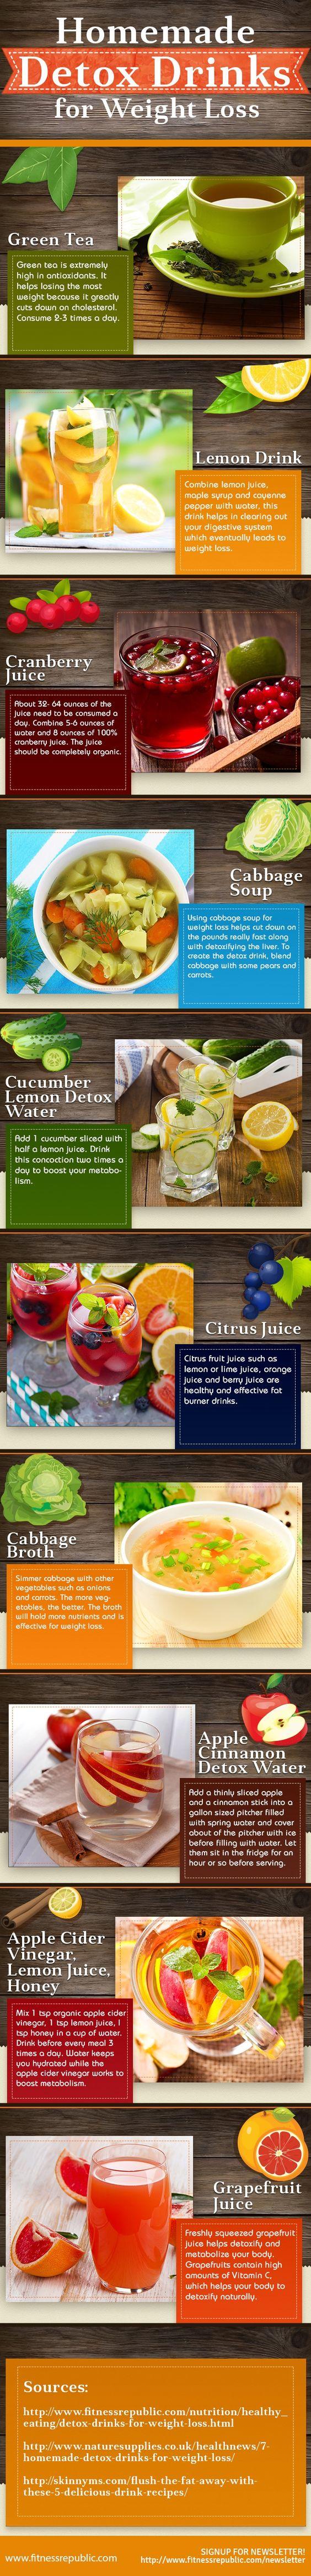 Detox Drinks That Actually Taste Good